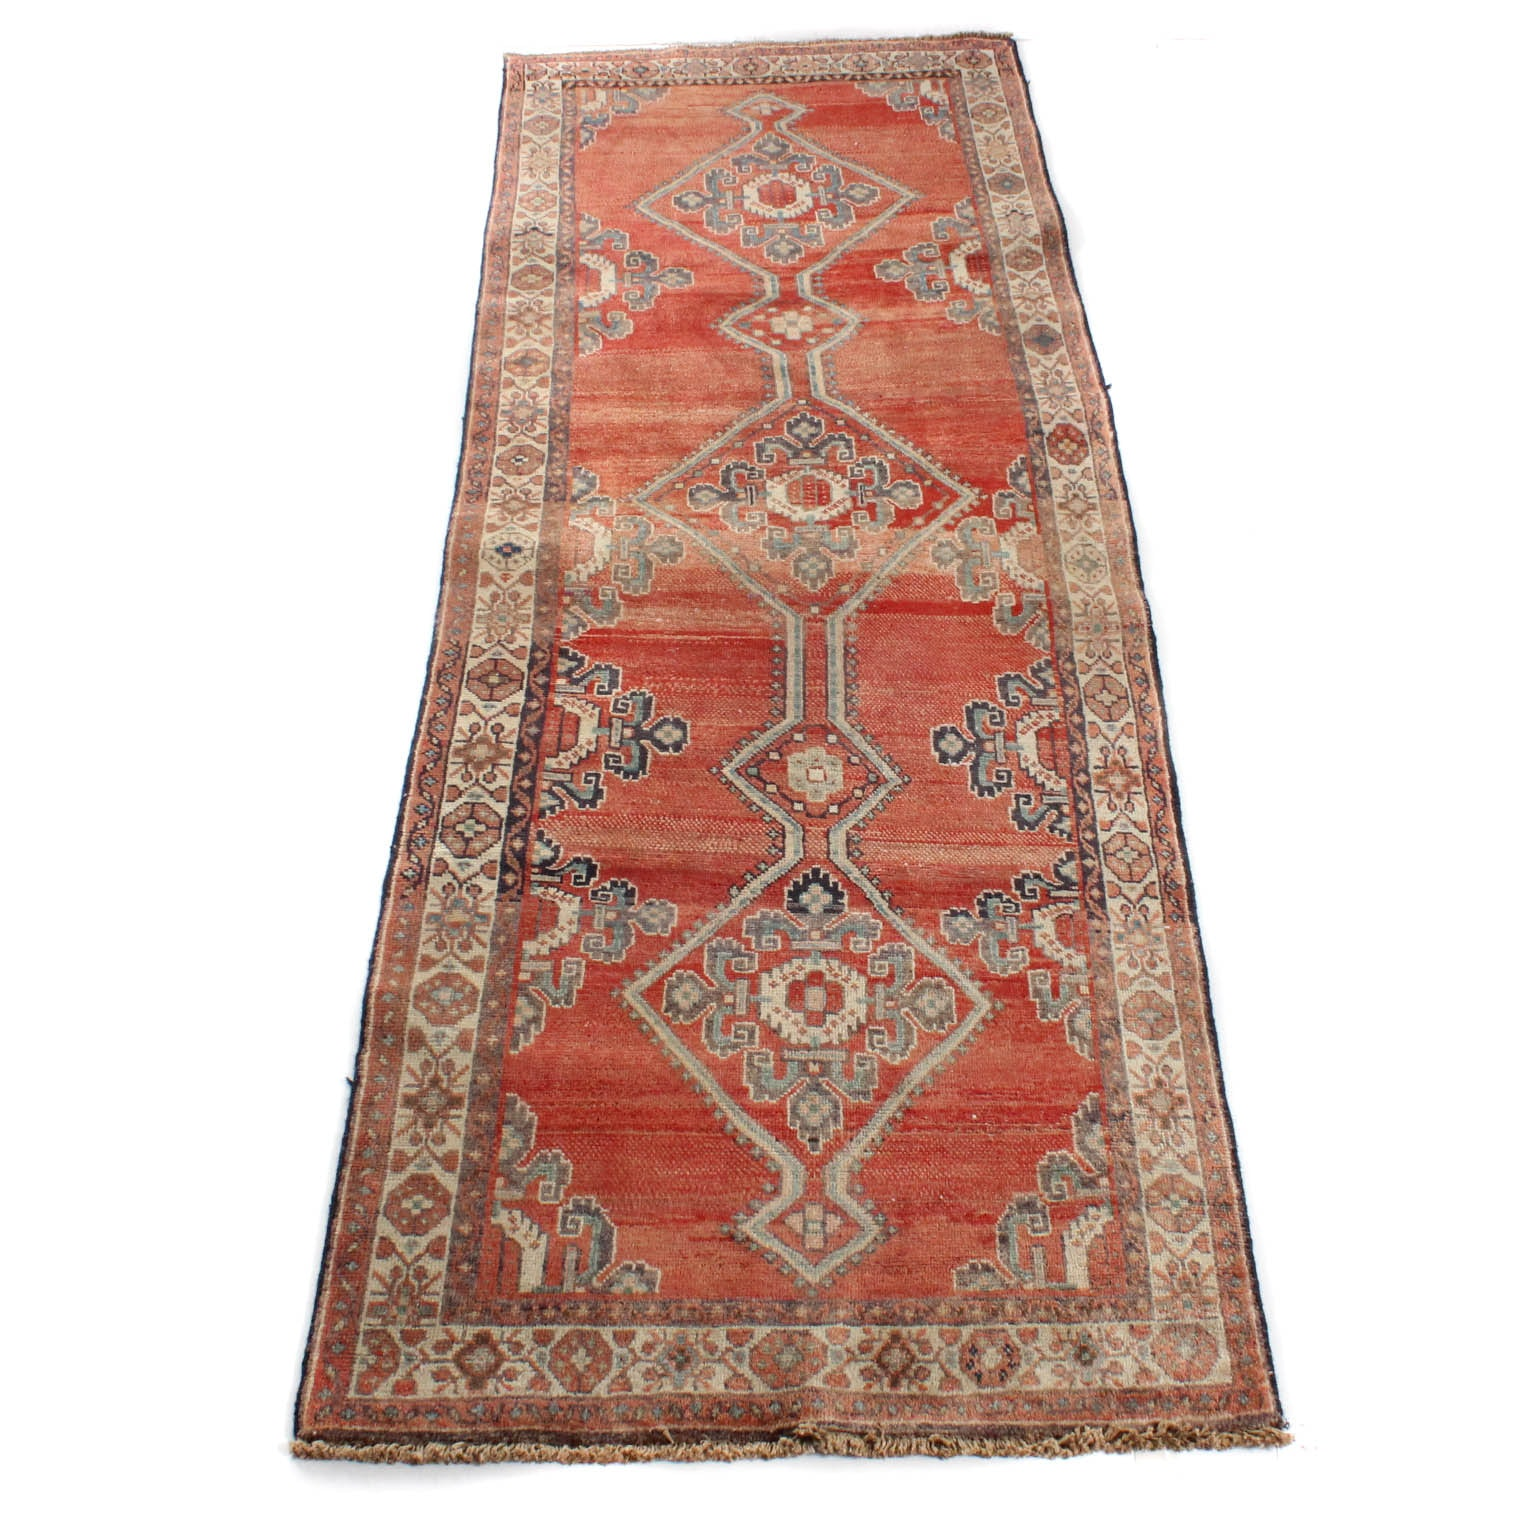 Vintage Hand-Knotted Persian Karaja Heriz Carpet Runner